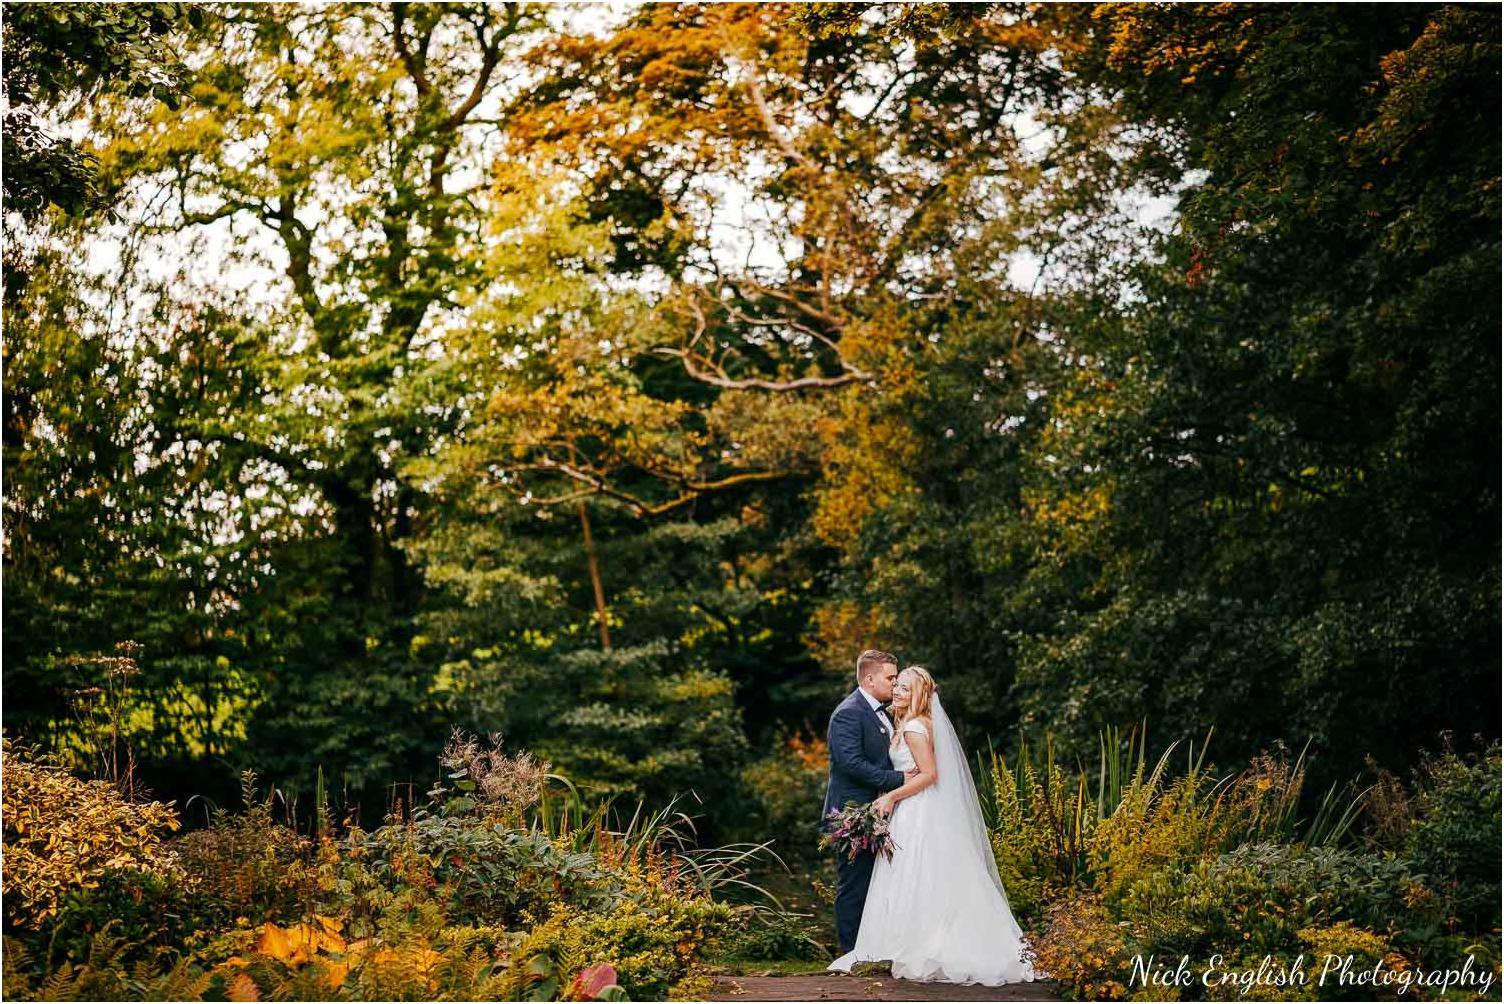 The_Ashes_Barn_Endon_Stoke_Wedding_Photographer-78.jpg